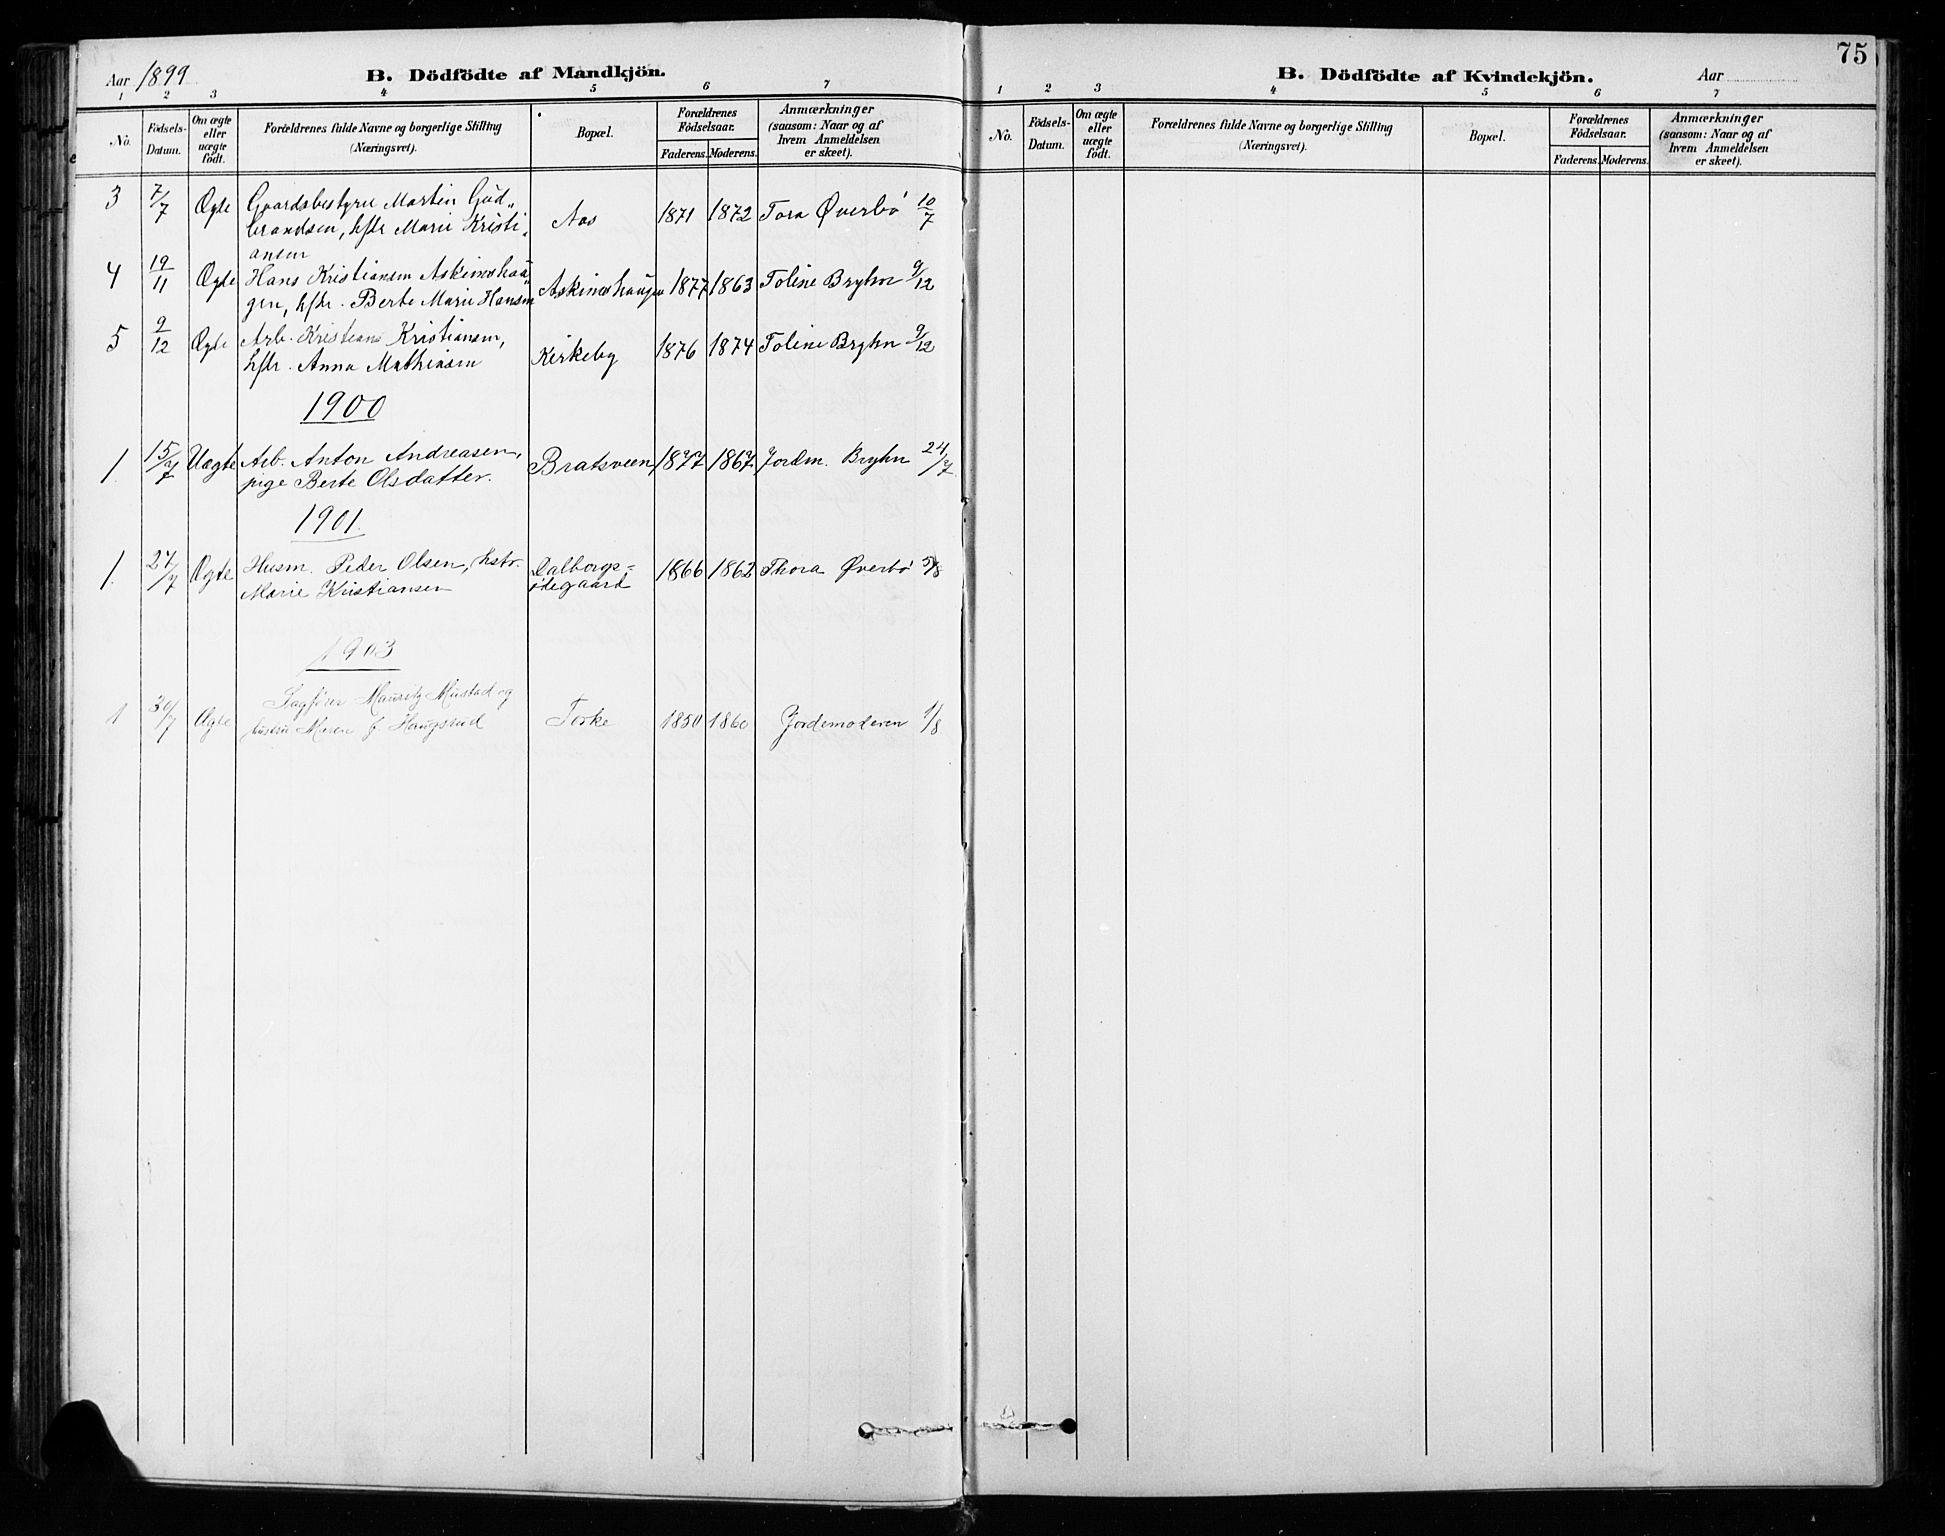 SAH, Vardal prestekontor, H/Ha/Hab/L0010: Klokkerbok nr. 10, 1895-1903, s. 75